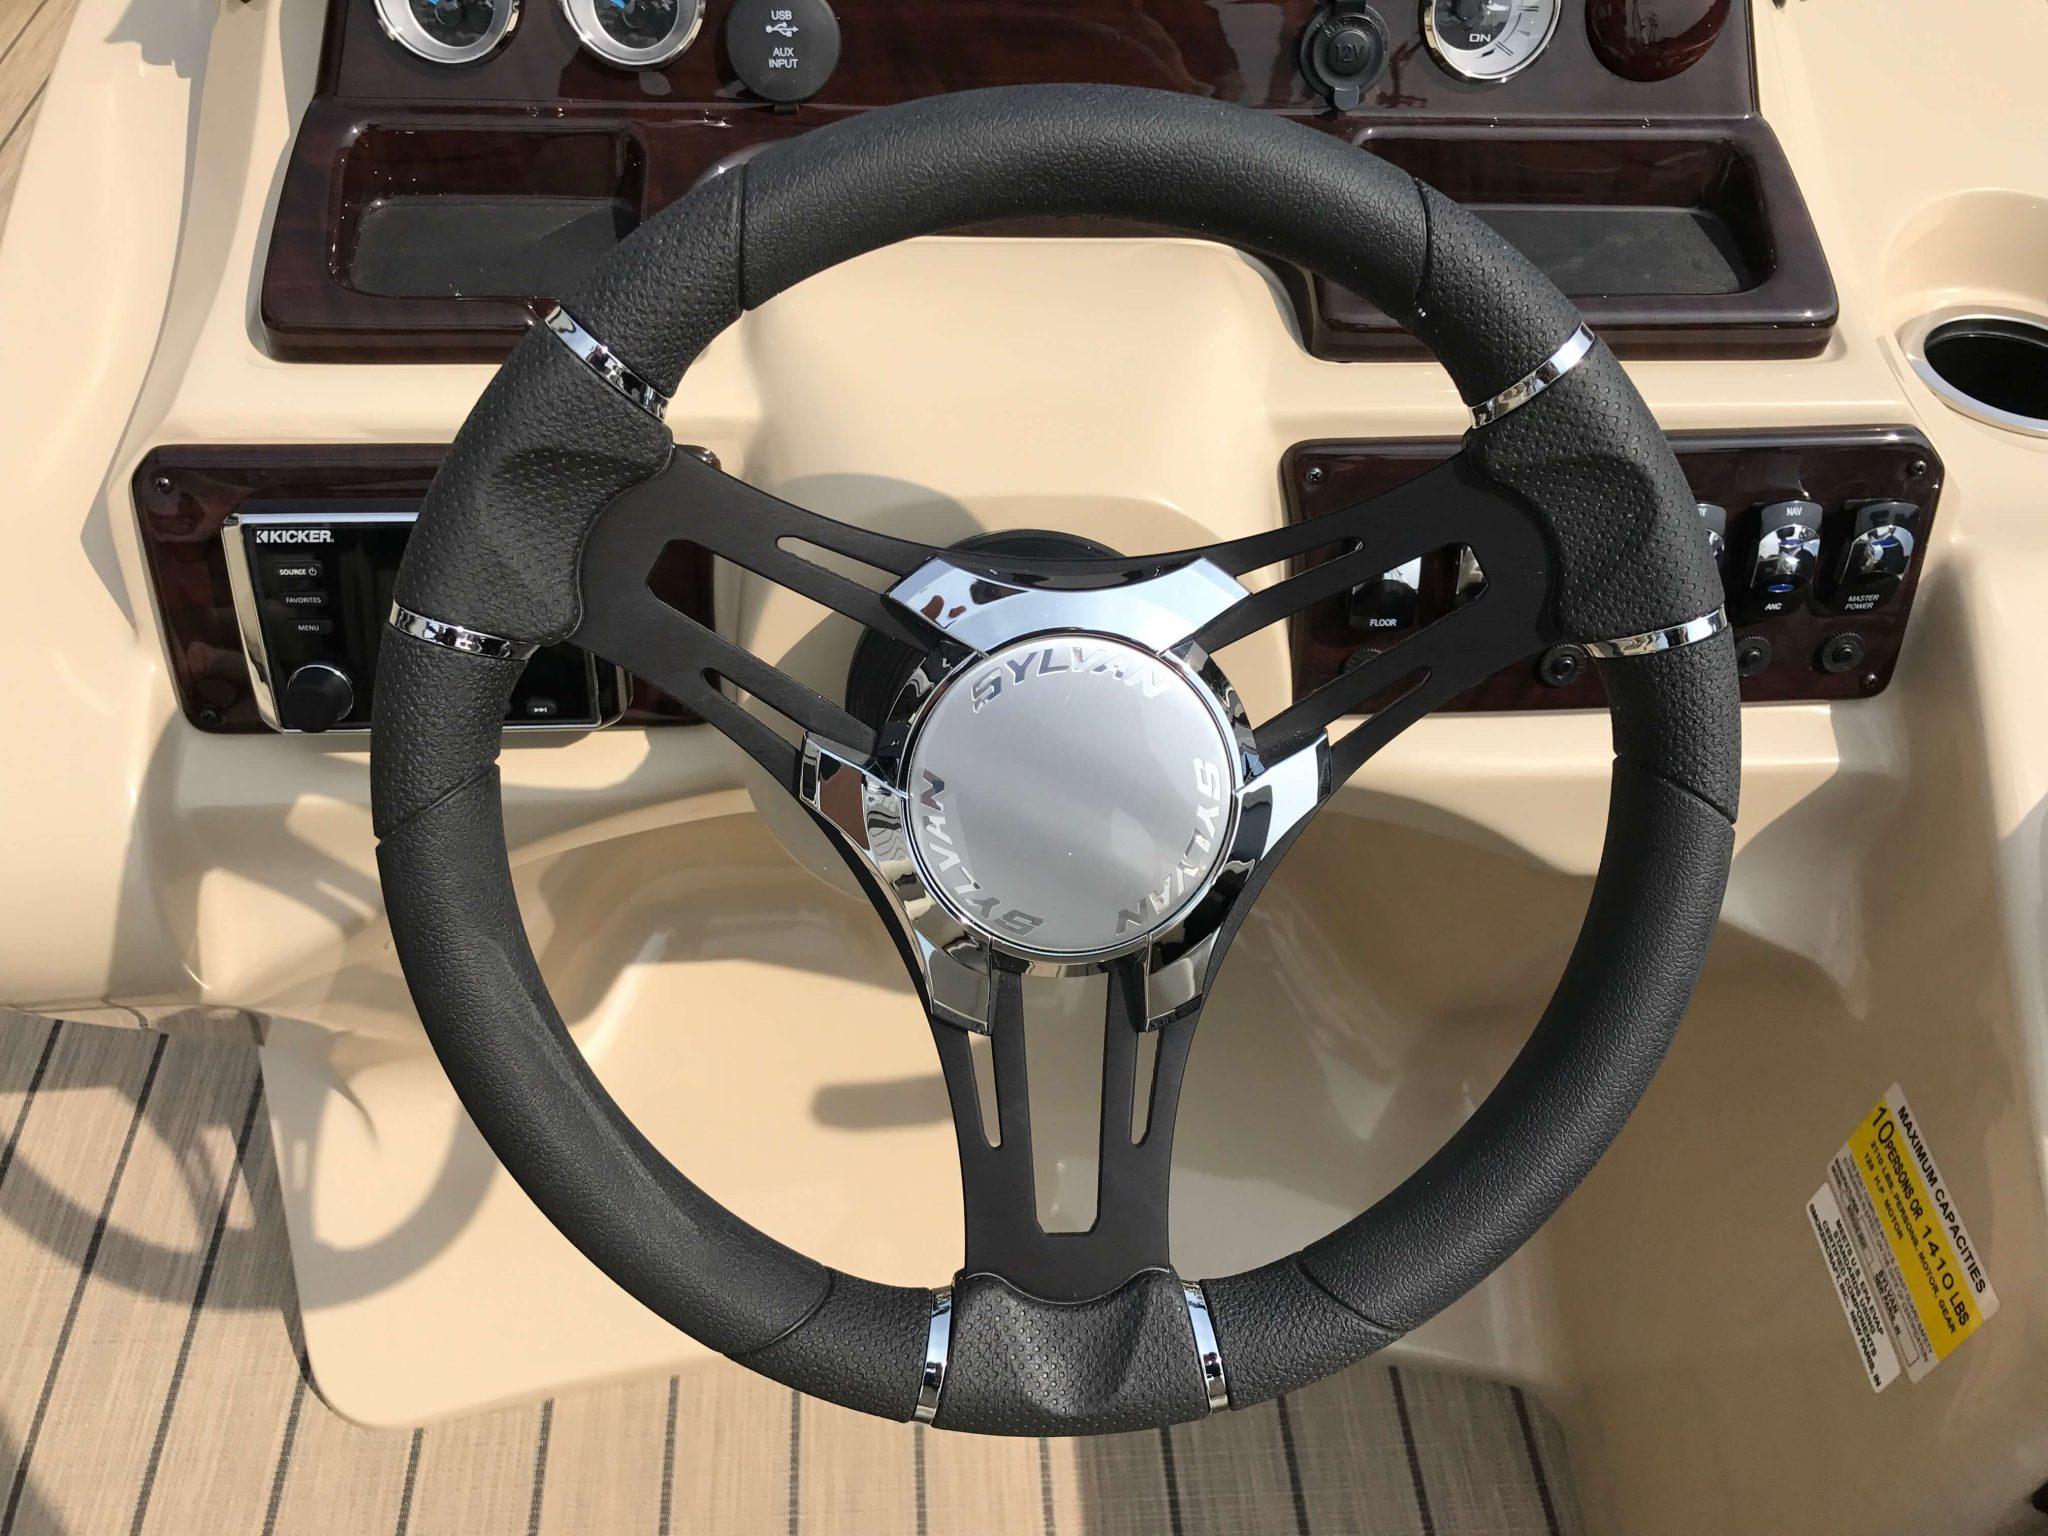 2019 Sylvan 8520 LZ LE Steering Wheel